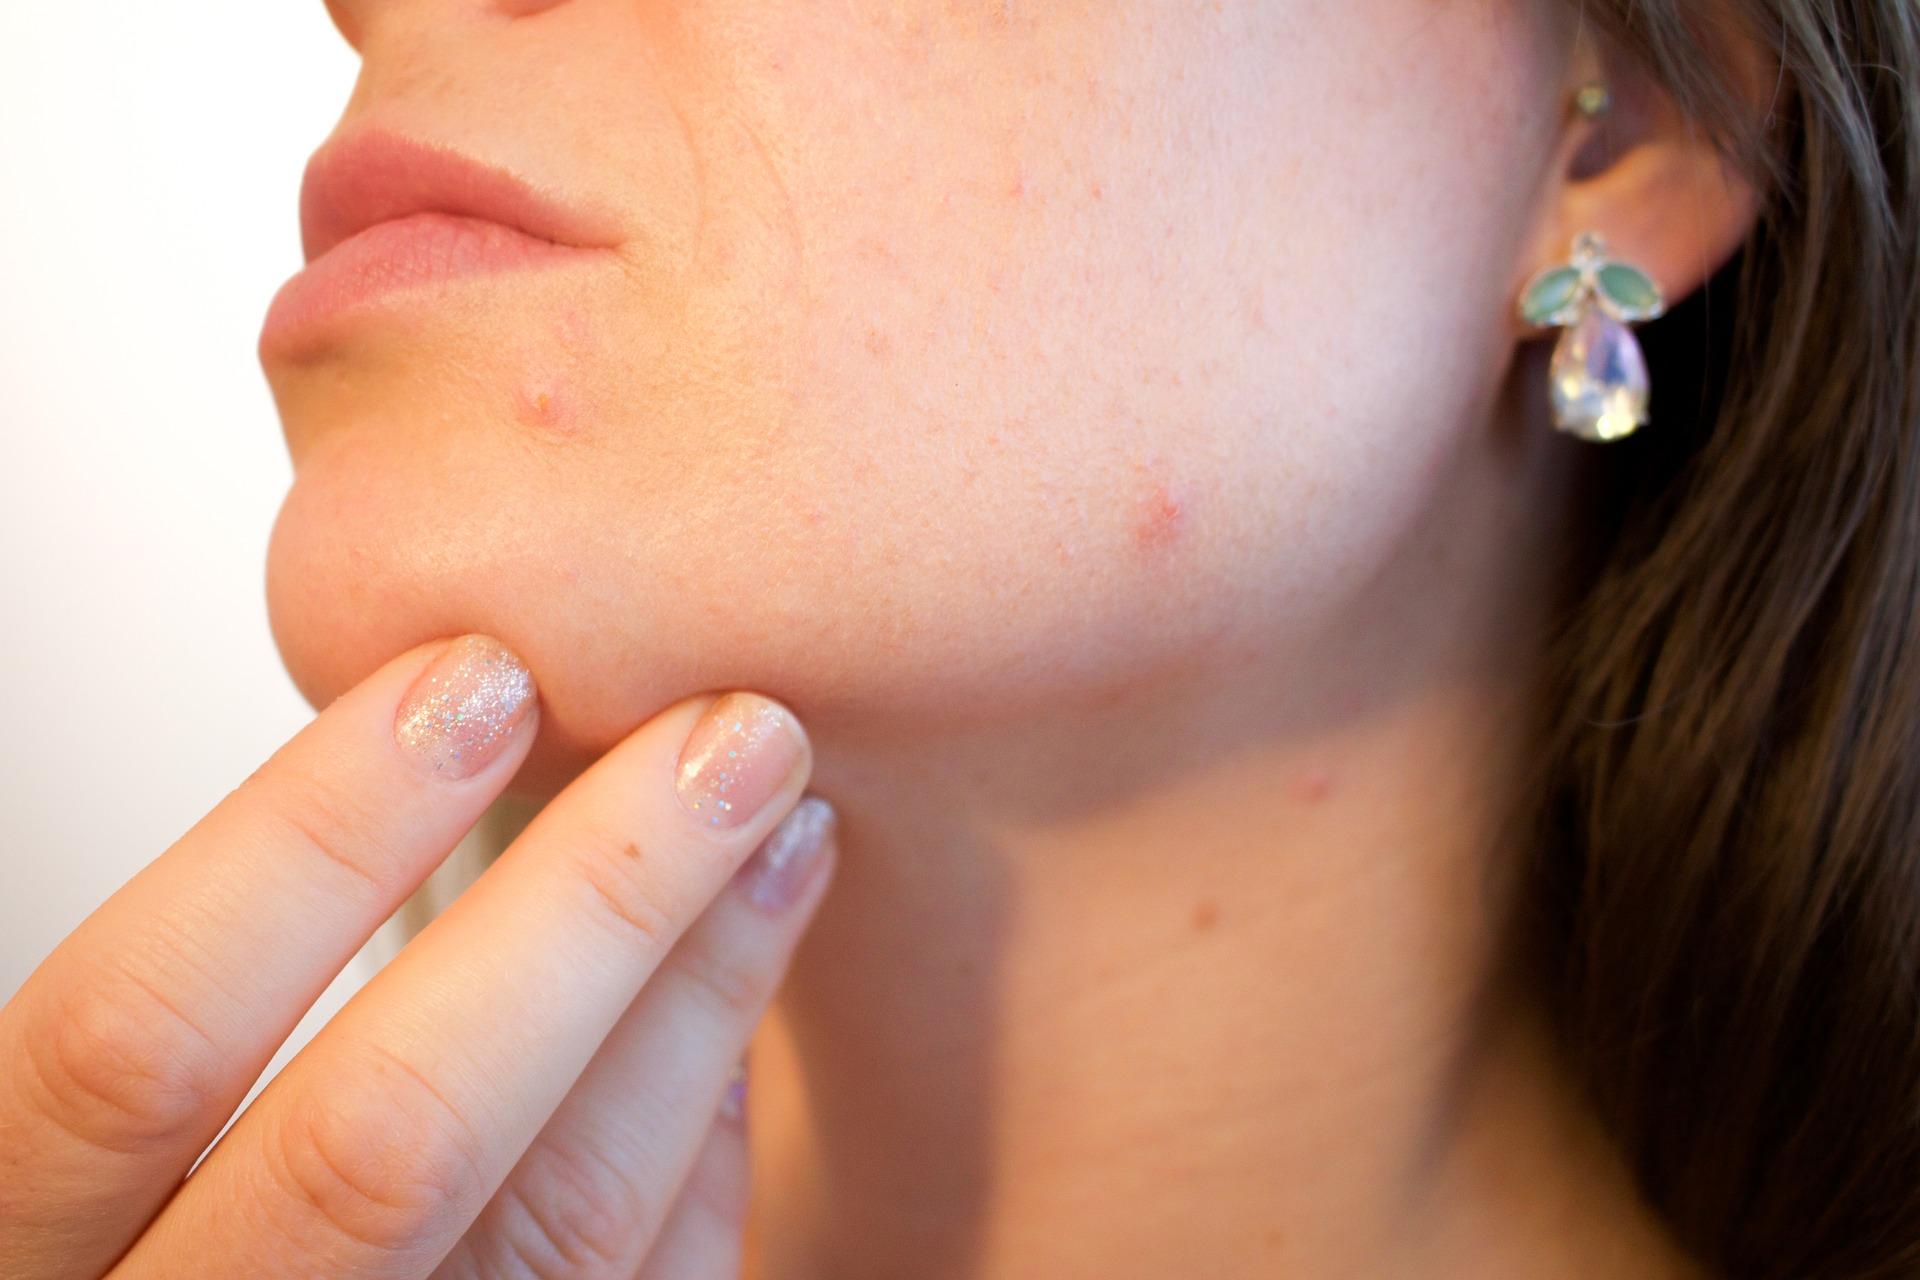 acne femme mains visage